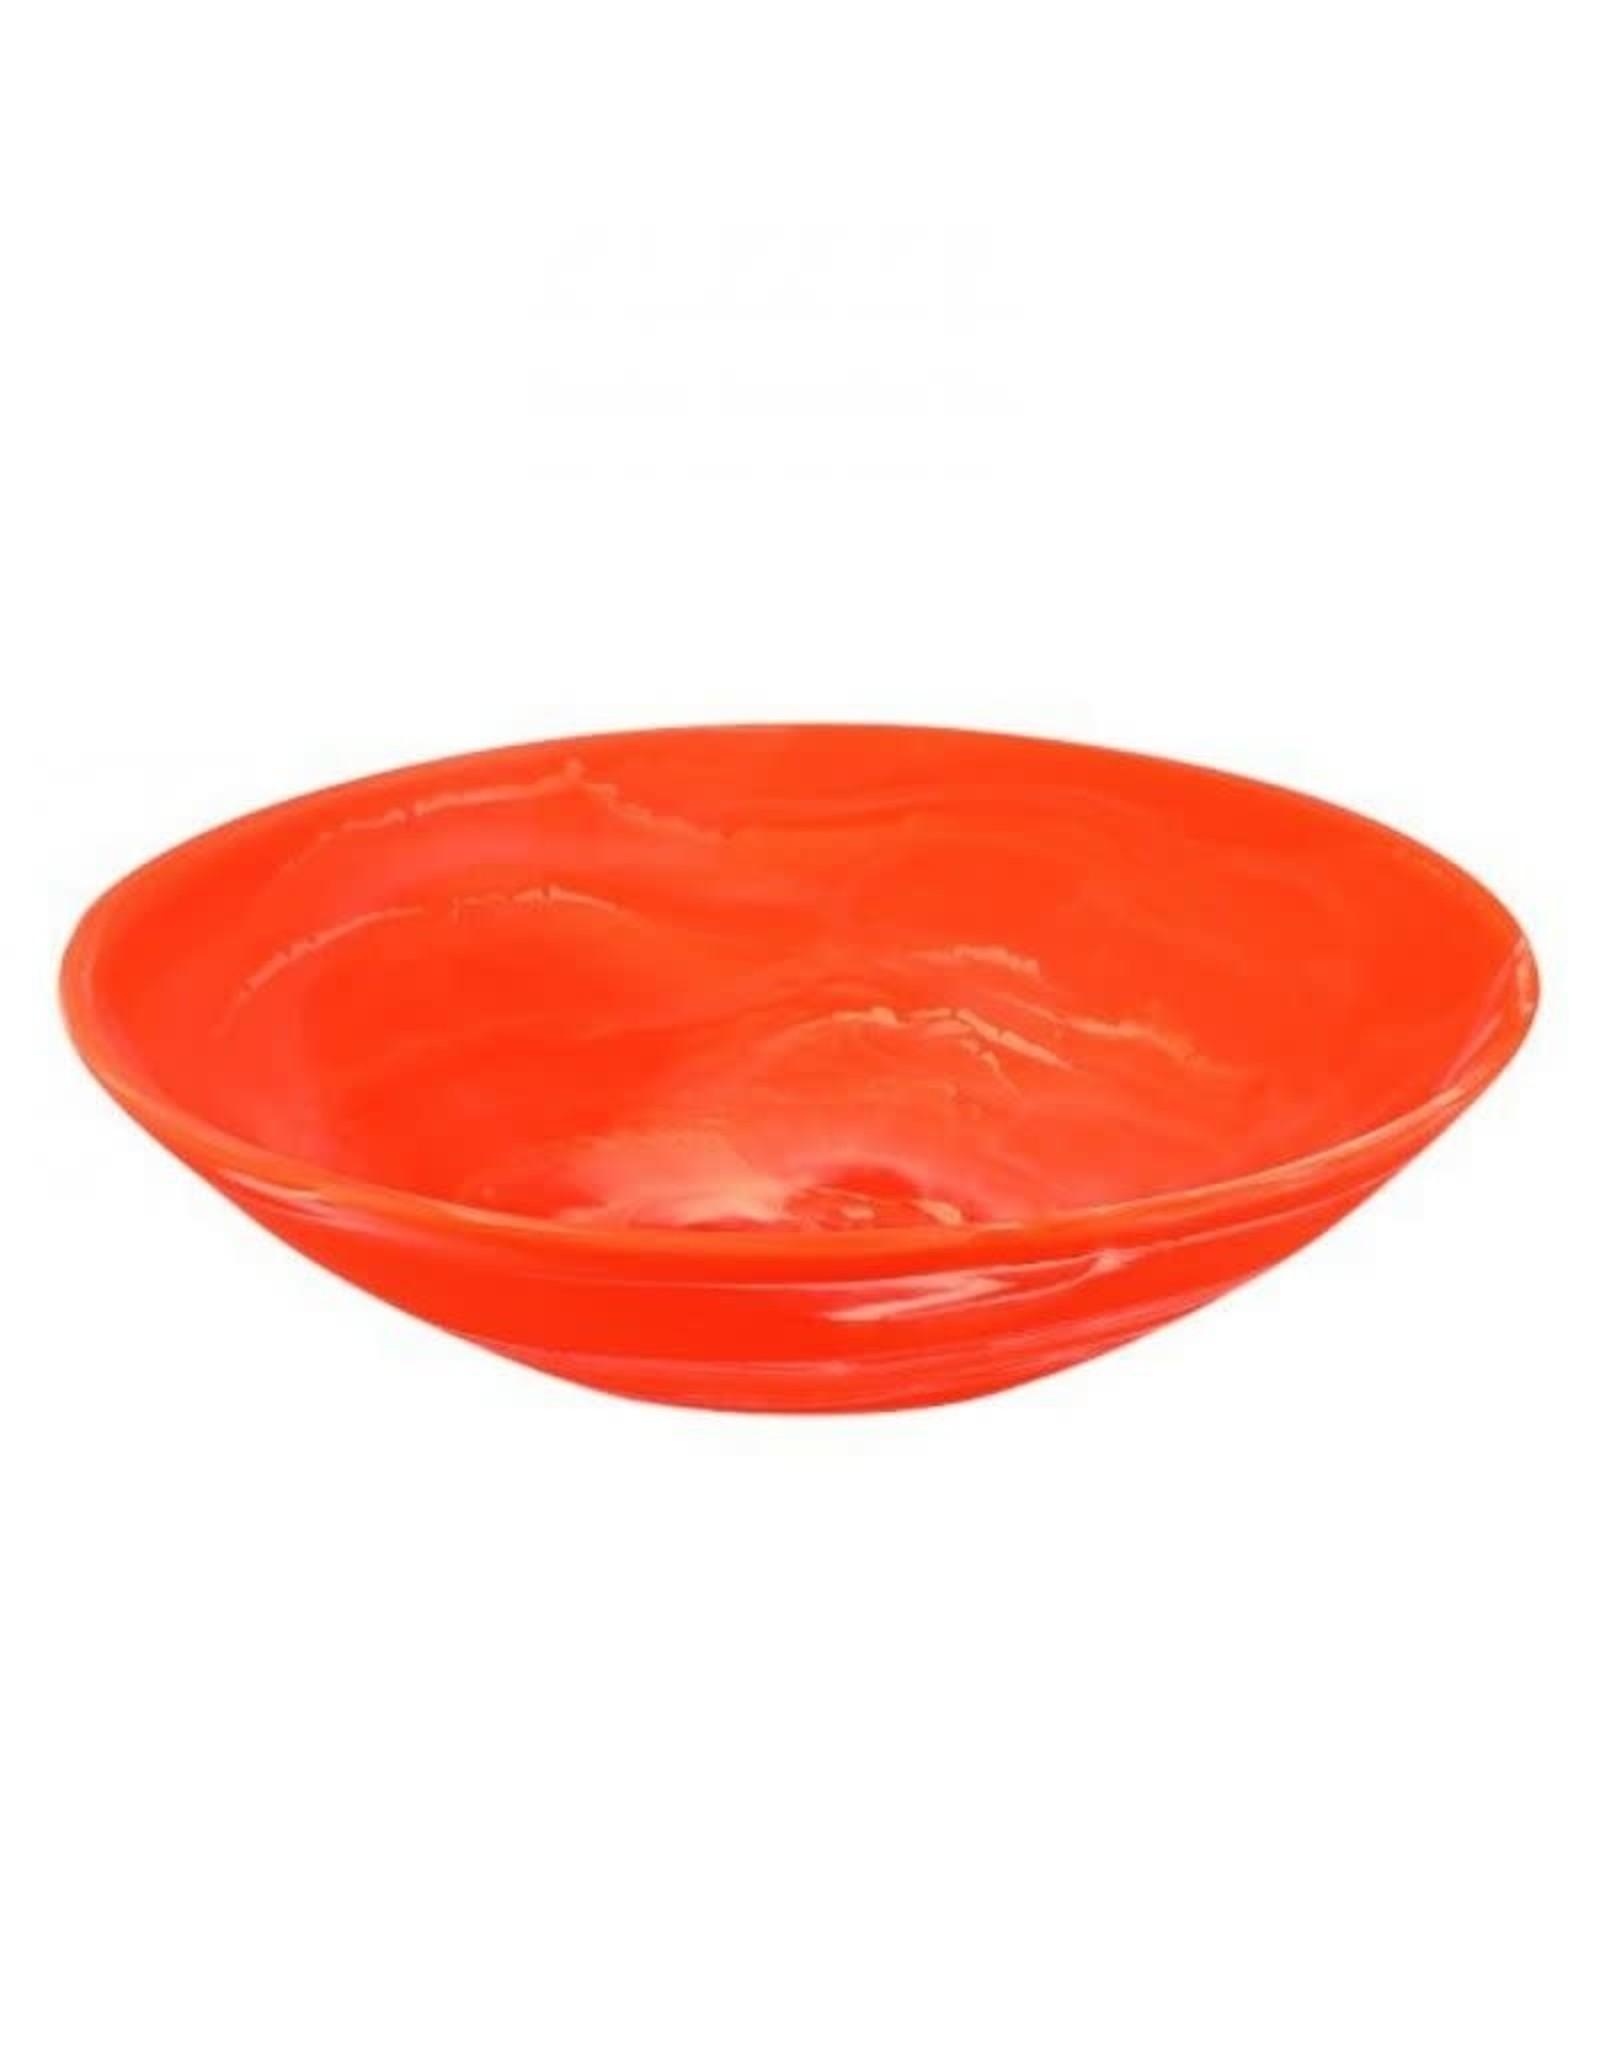 Nashi Home Everyday Medium Bowl with Servers Set Apricot Swirl